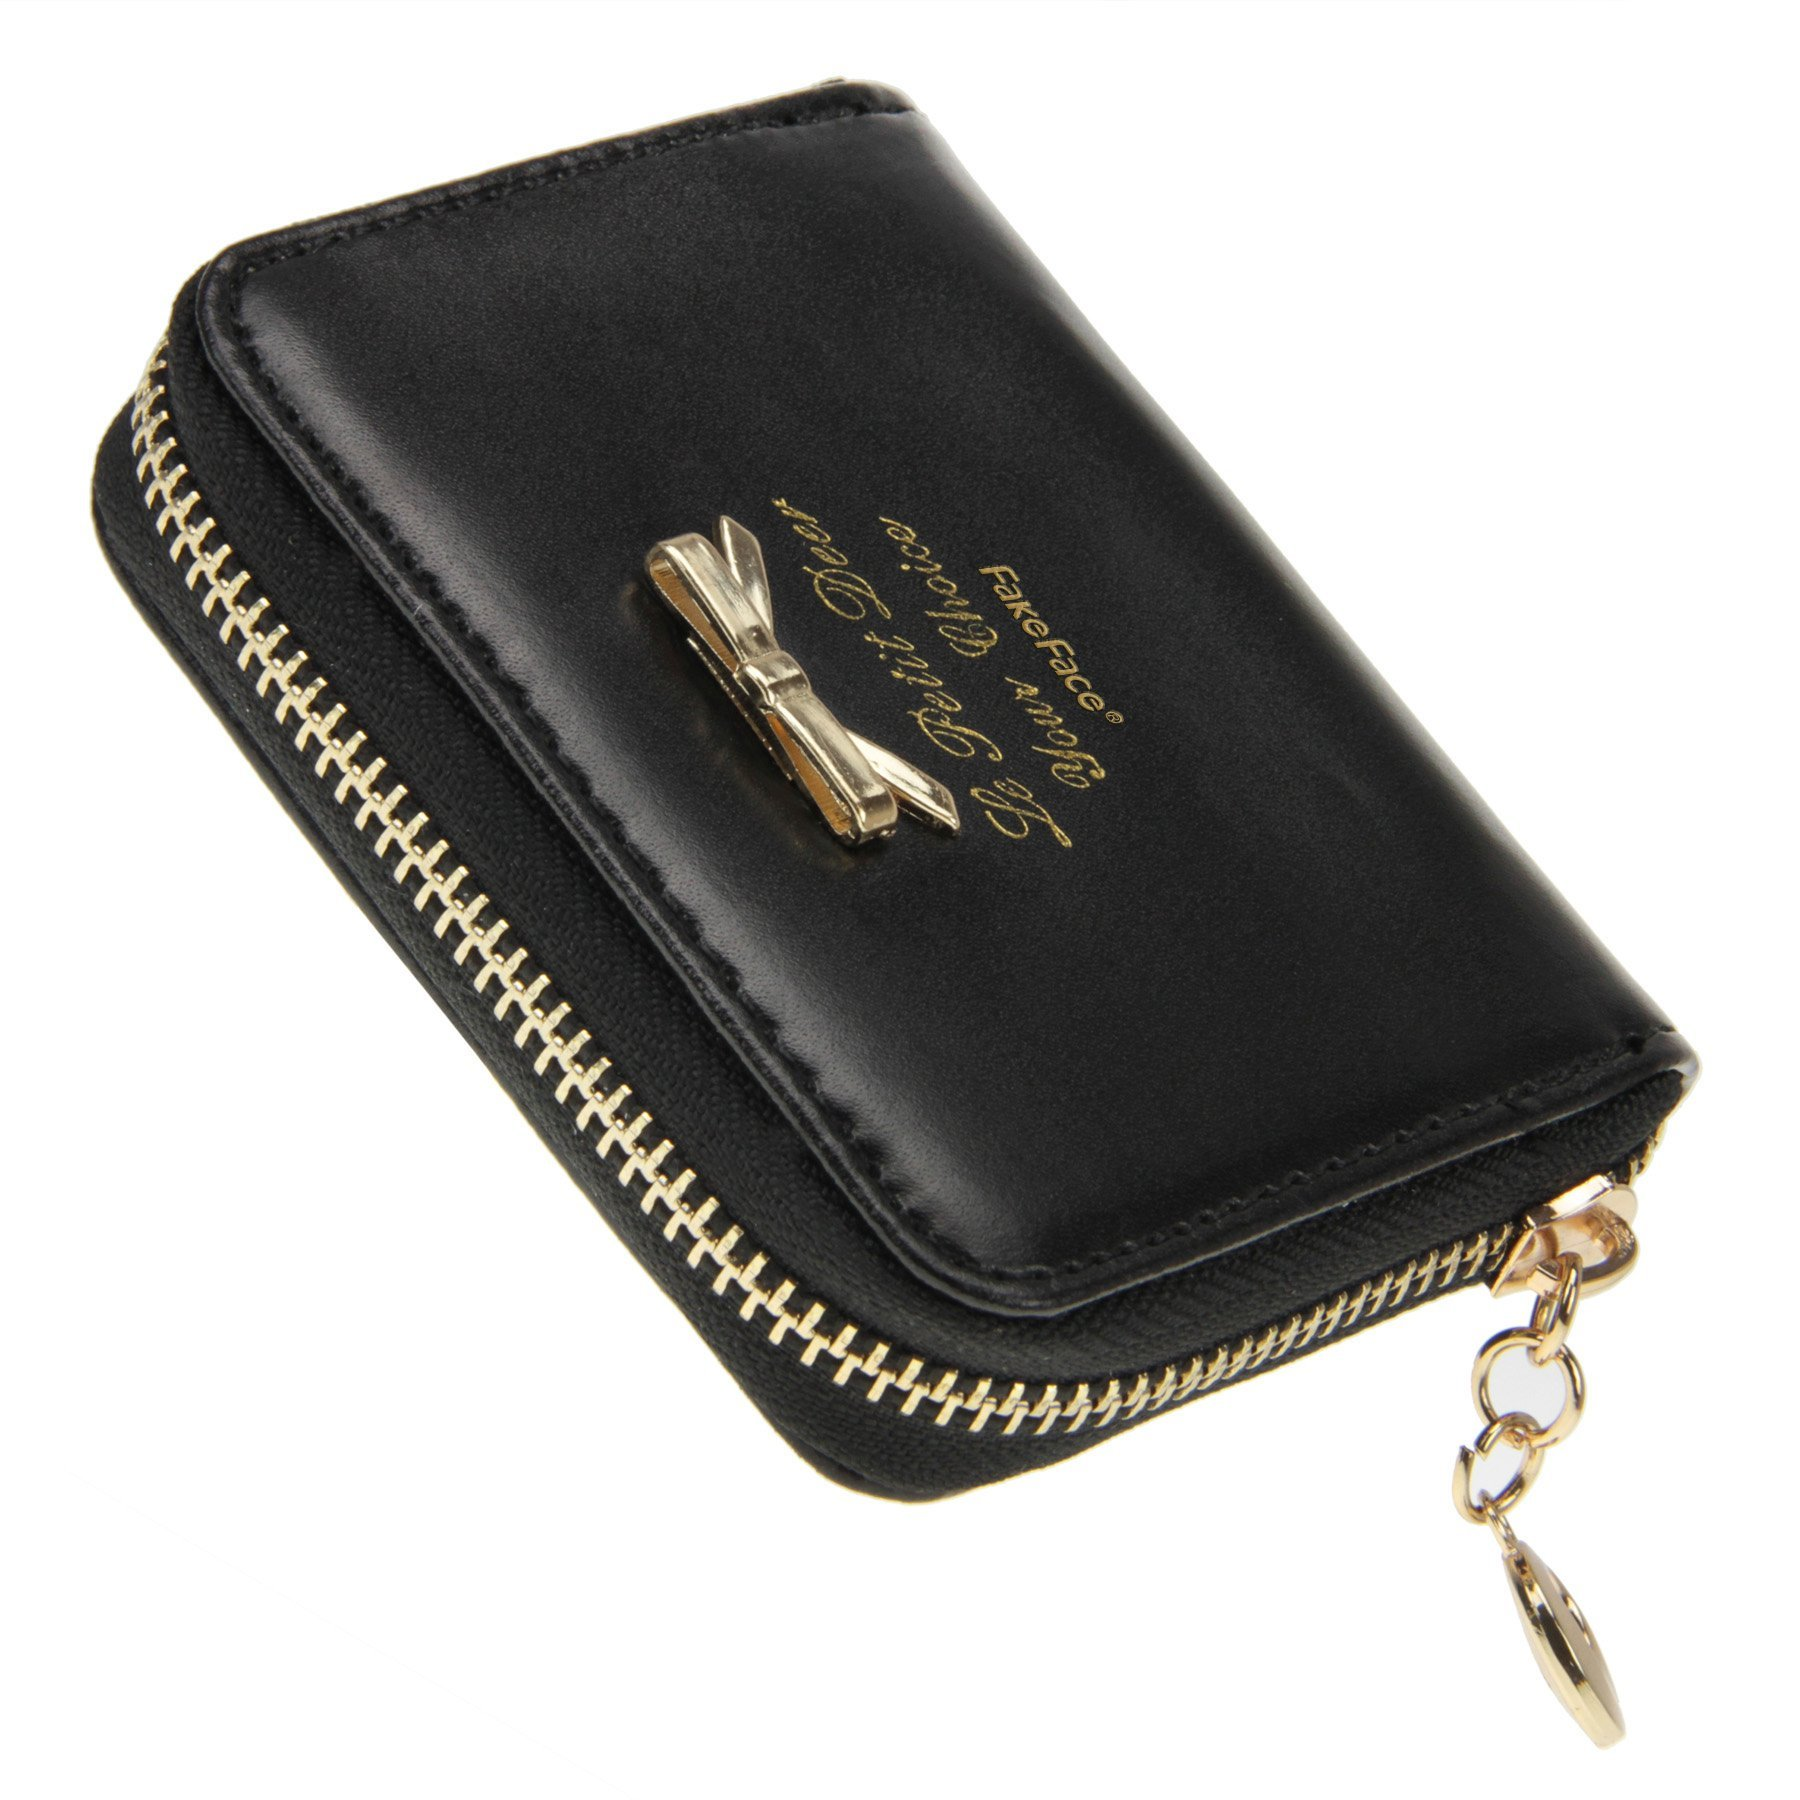 Women Girls Cute Bowknot Waterproof PU Leather Fold Mini Short Wallet Coin Purse Zipper Card Case Holder Clutch Small Handbag Nice Gift by Fakeface (Image #5)